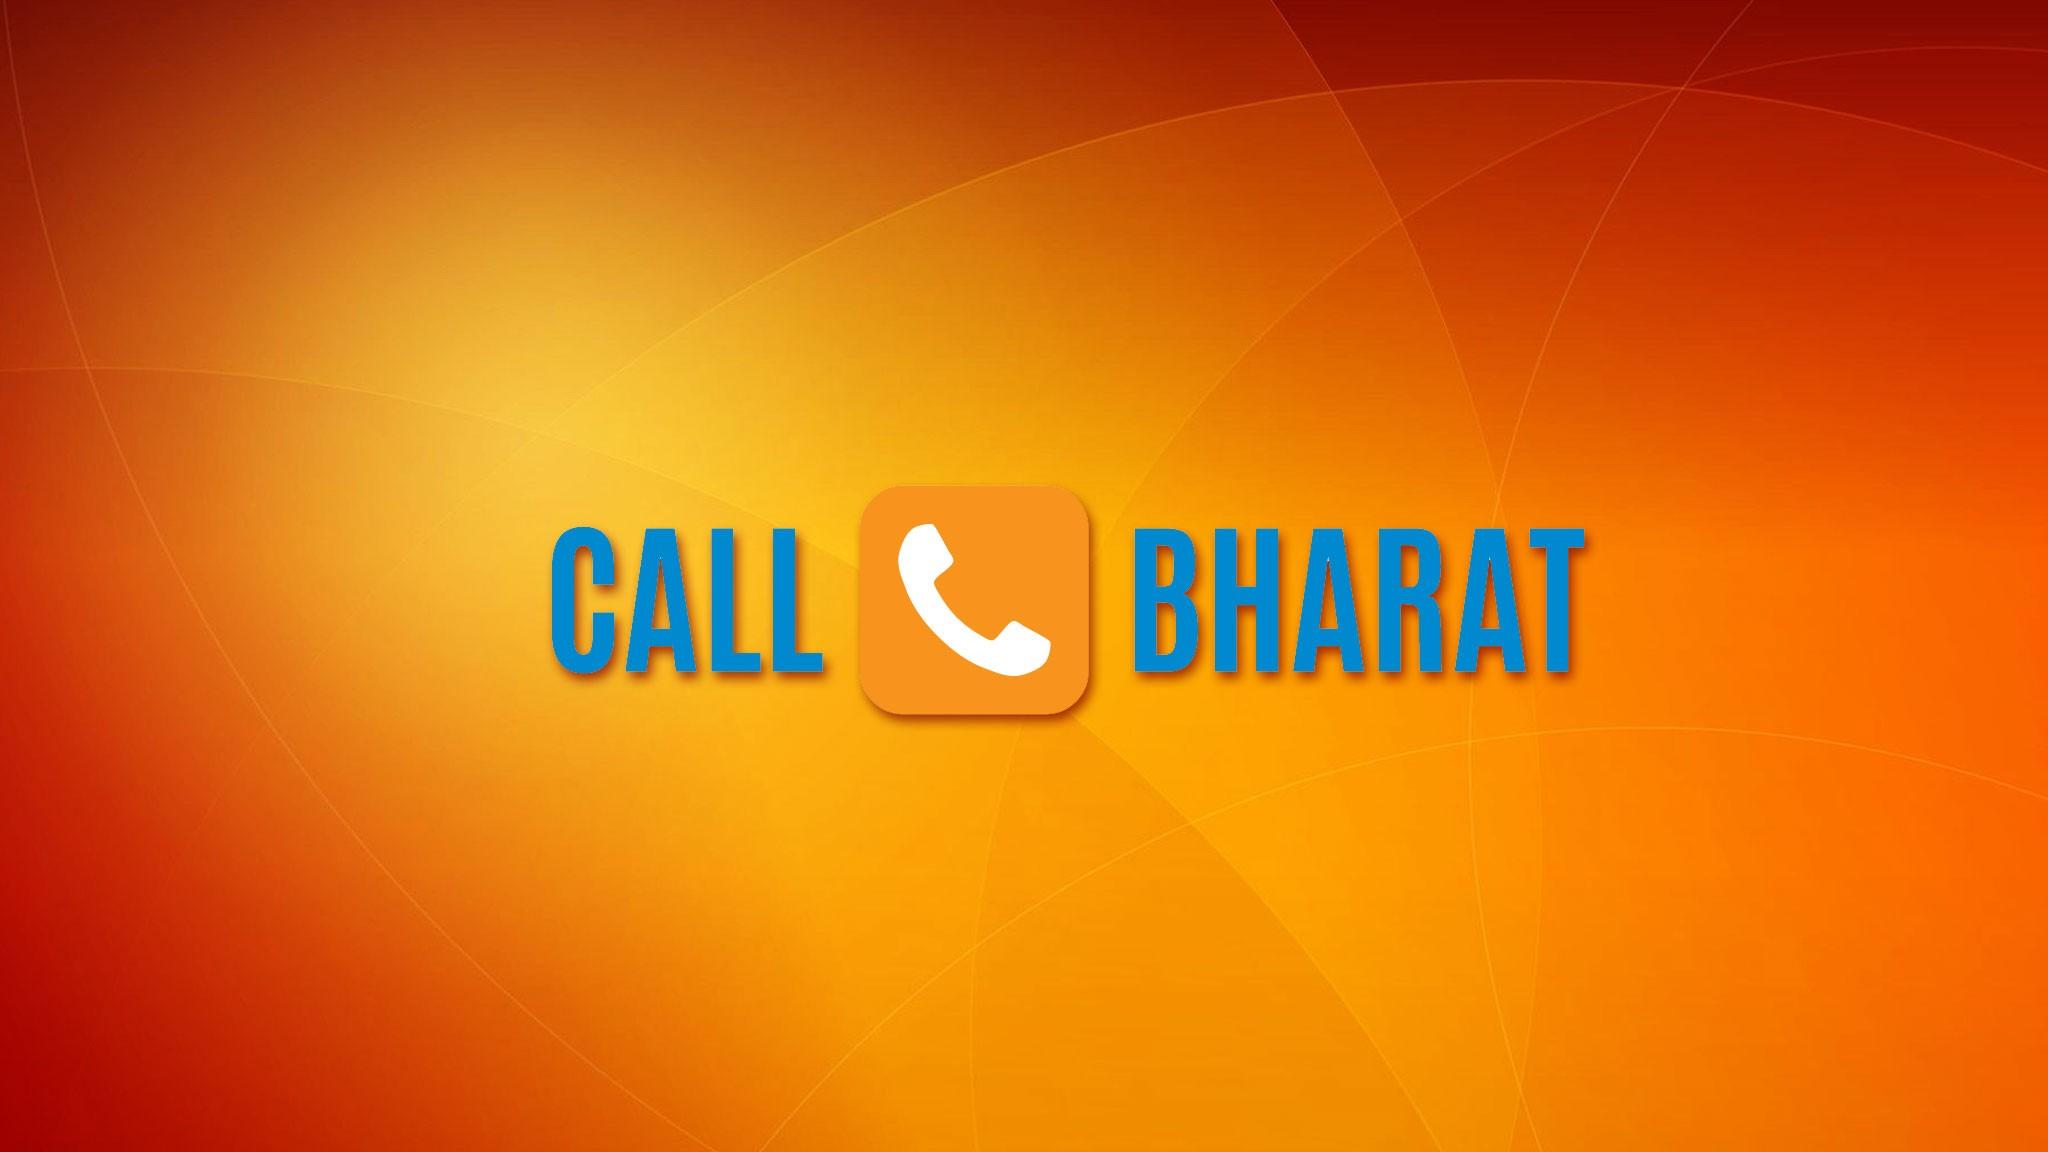 Call Bharat